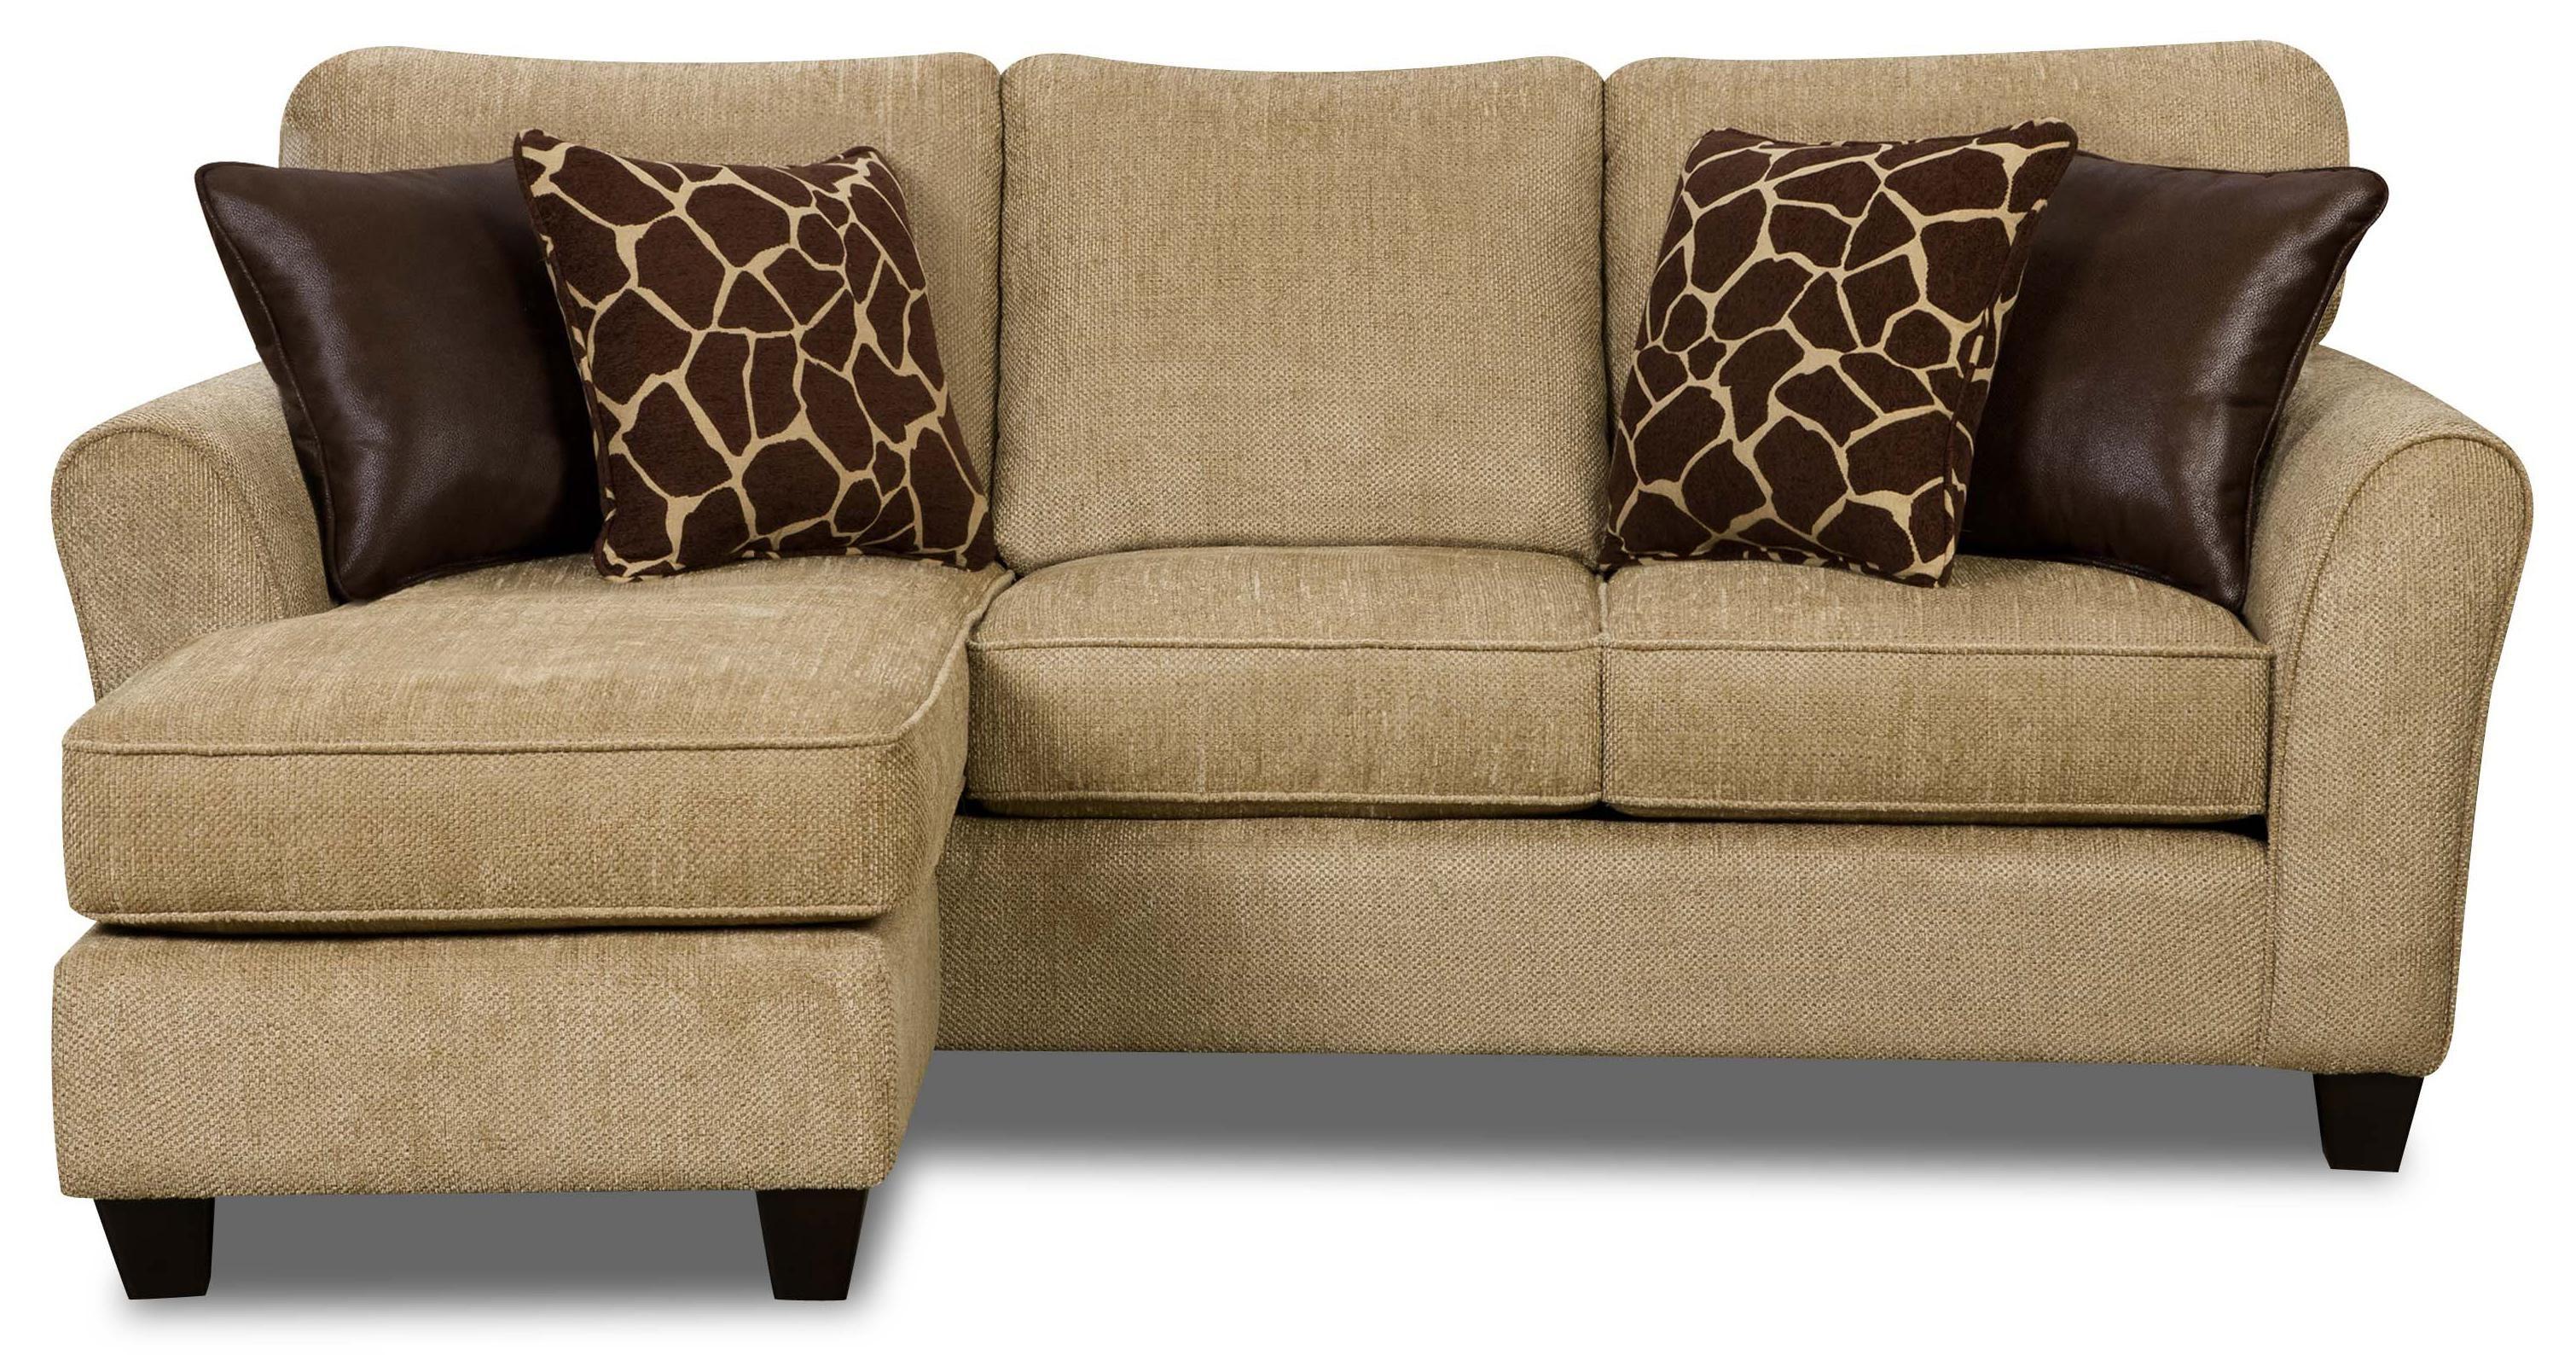 acme sectional sofa chocolate mayo fabrics 4808 chofa (sofa chaise) by fusion furniture | for the ...